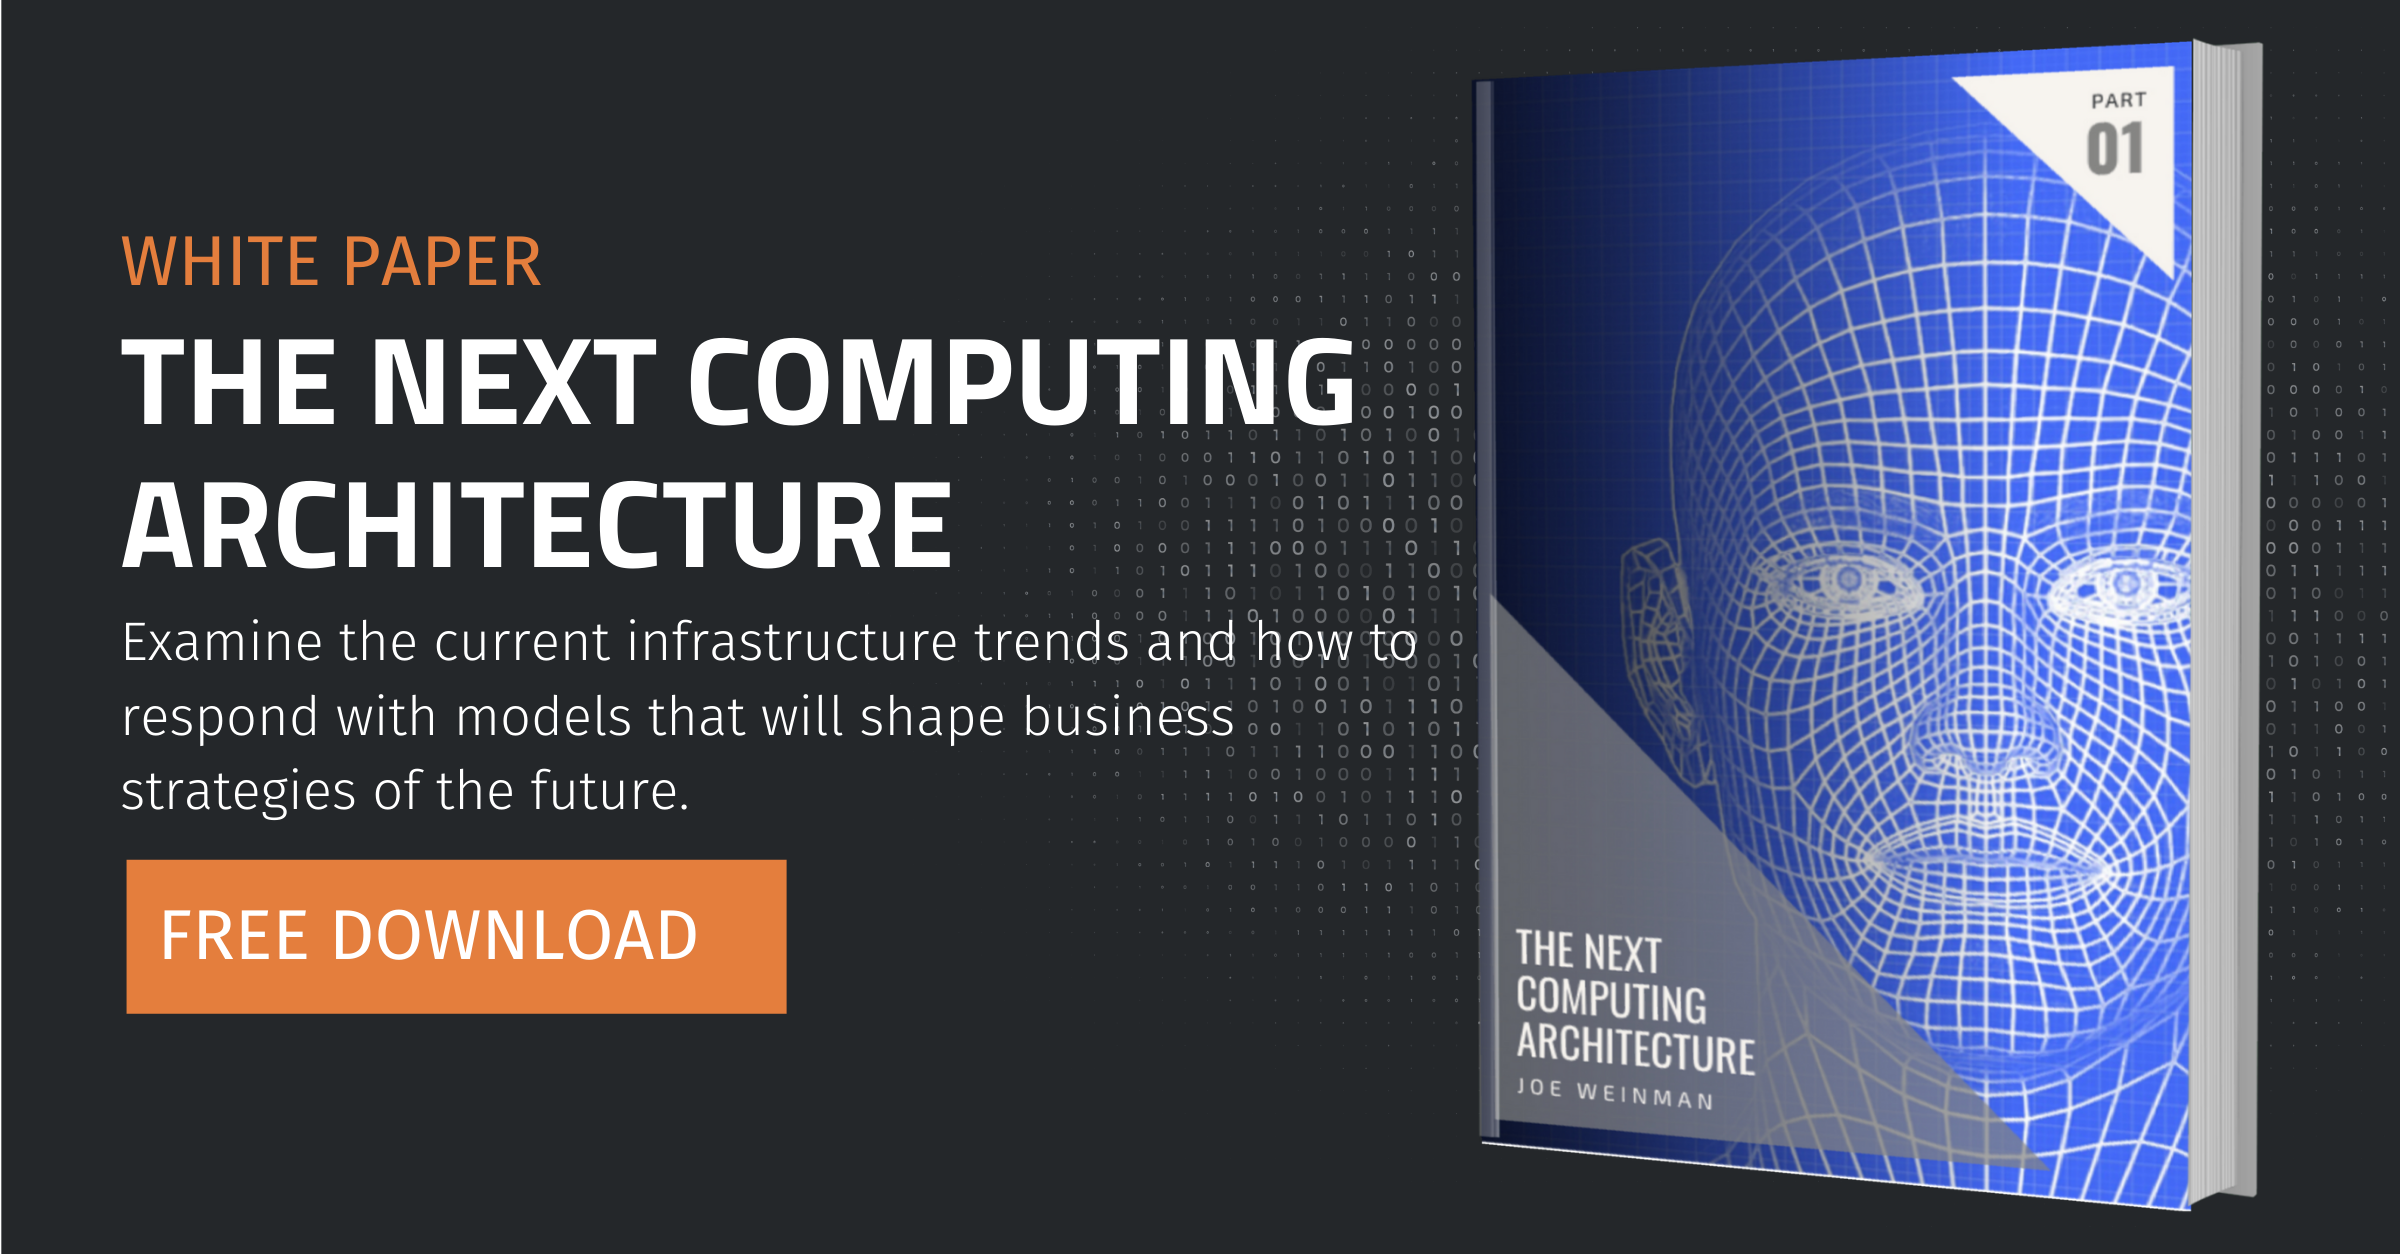 The Next Computing Architecture Whitepaper